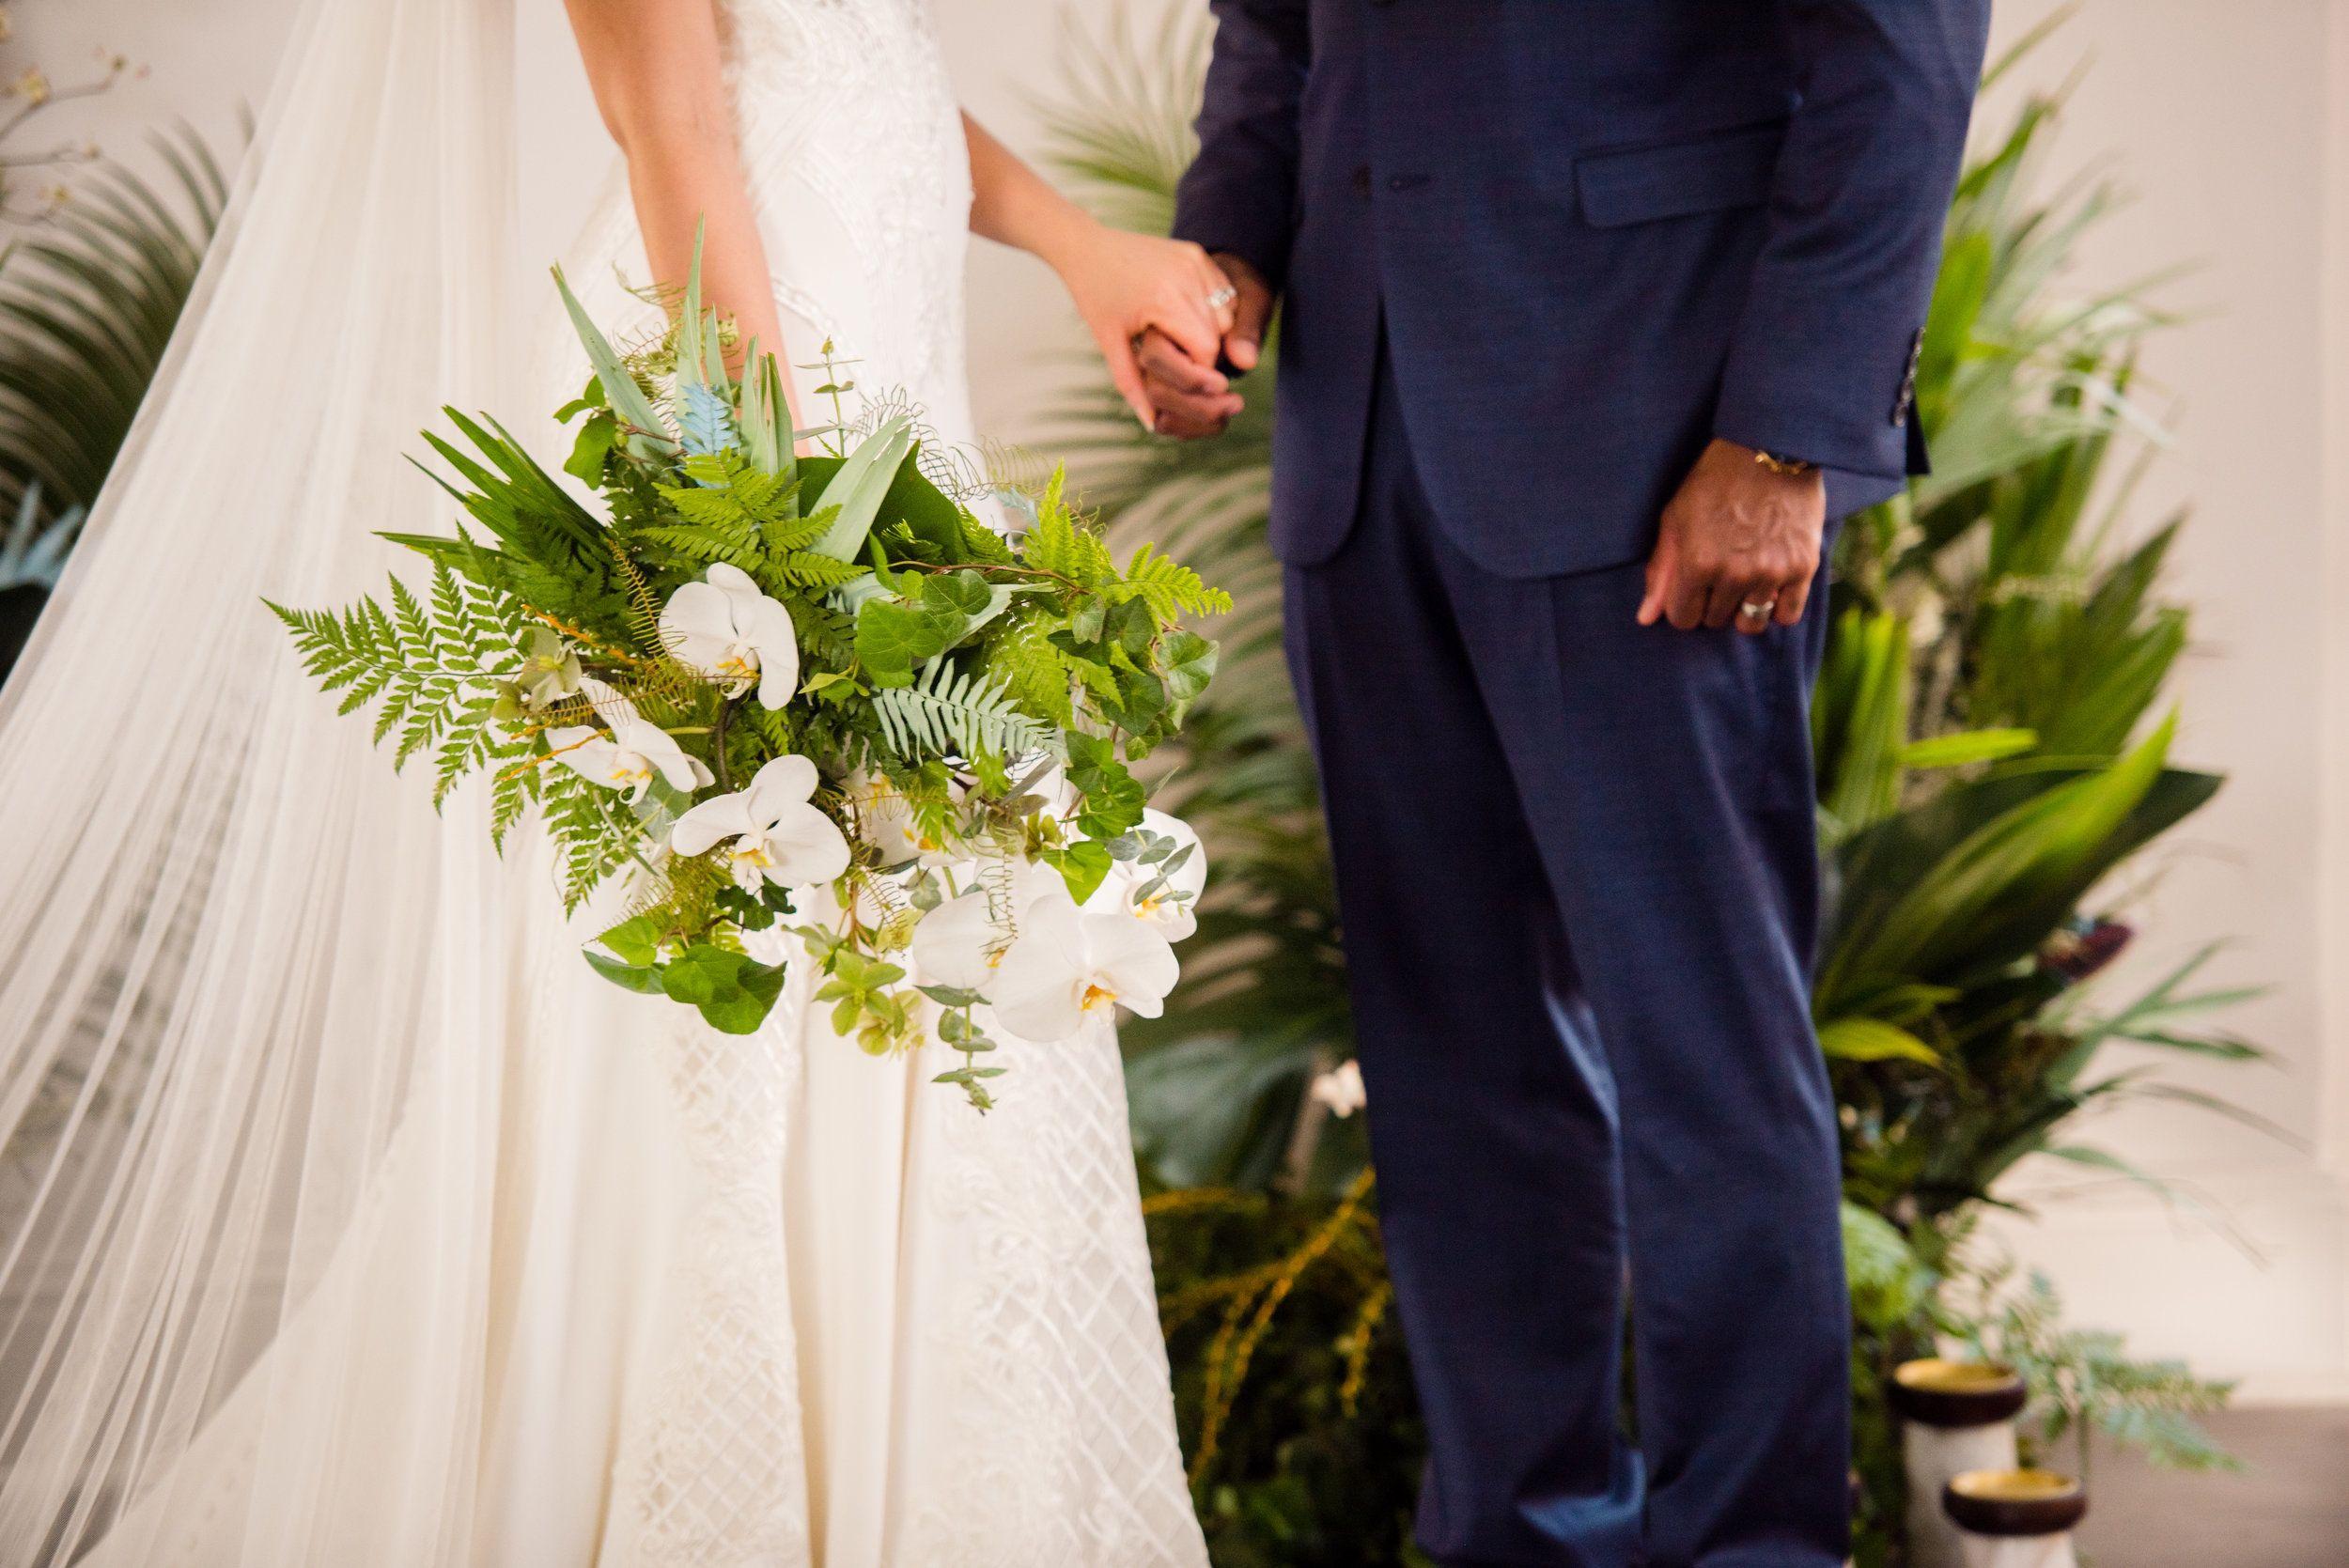 Those textures! The bouquet, the dress details, the veil